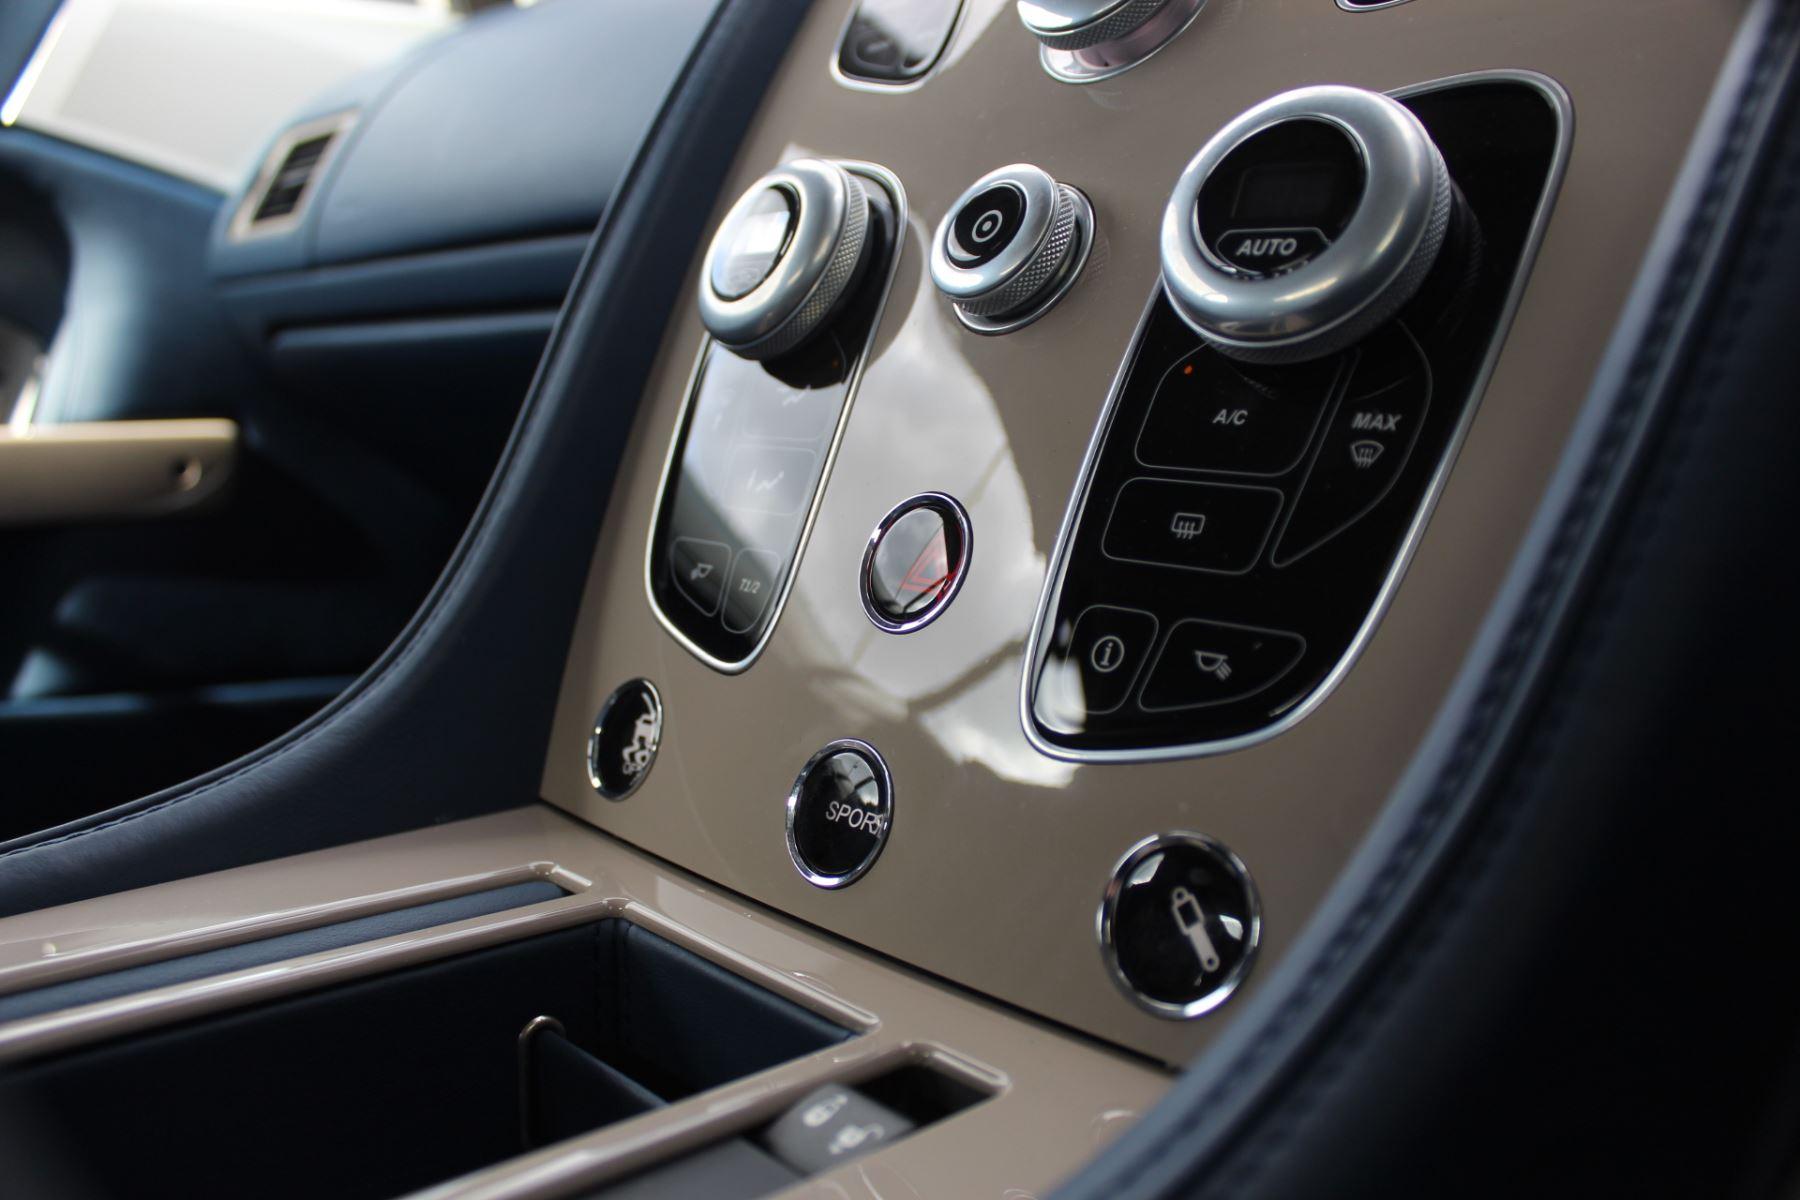 Aston Martin DB9 V12 GT 2dr Volante Touchtronic image 17